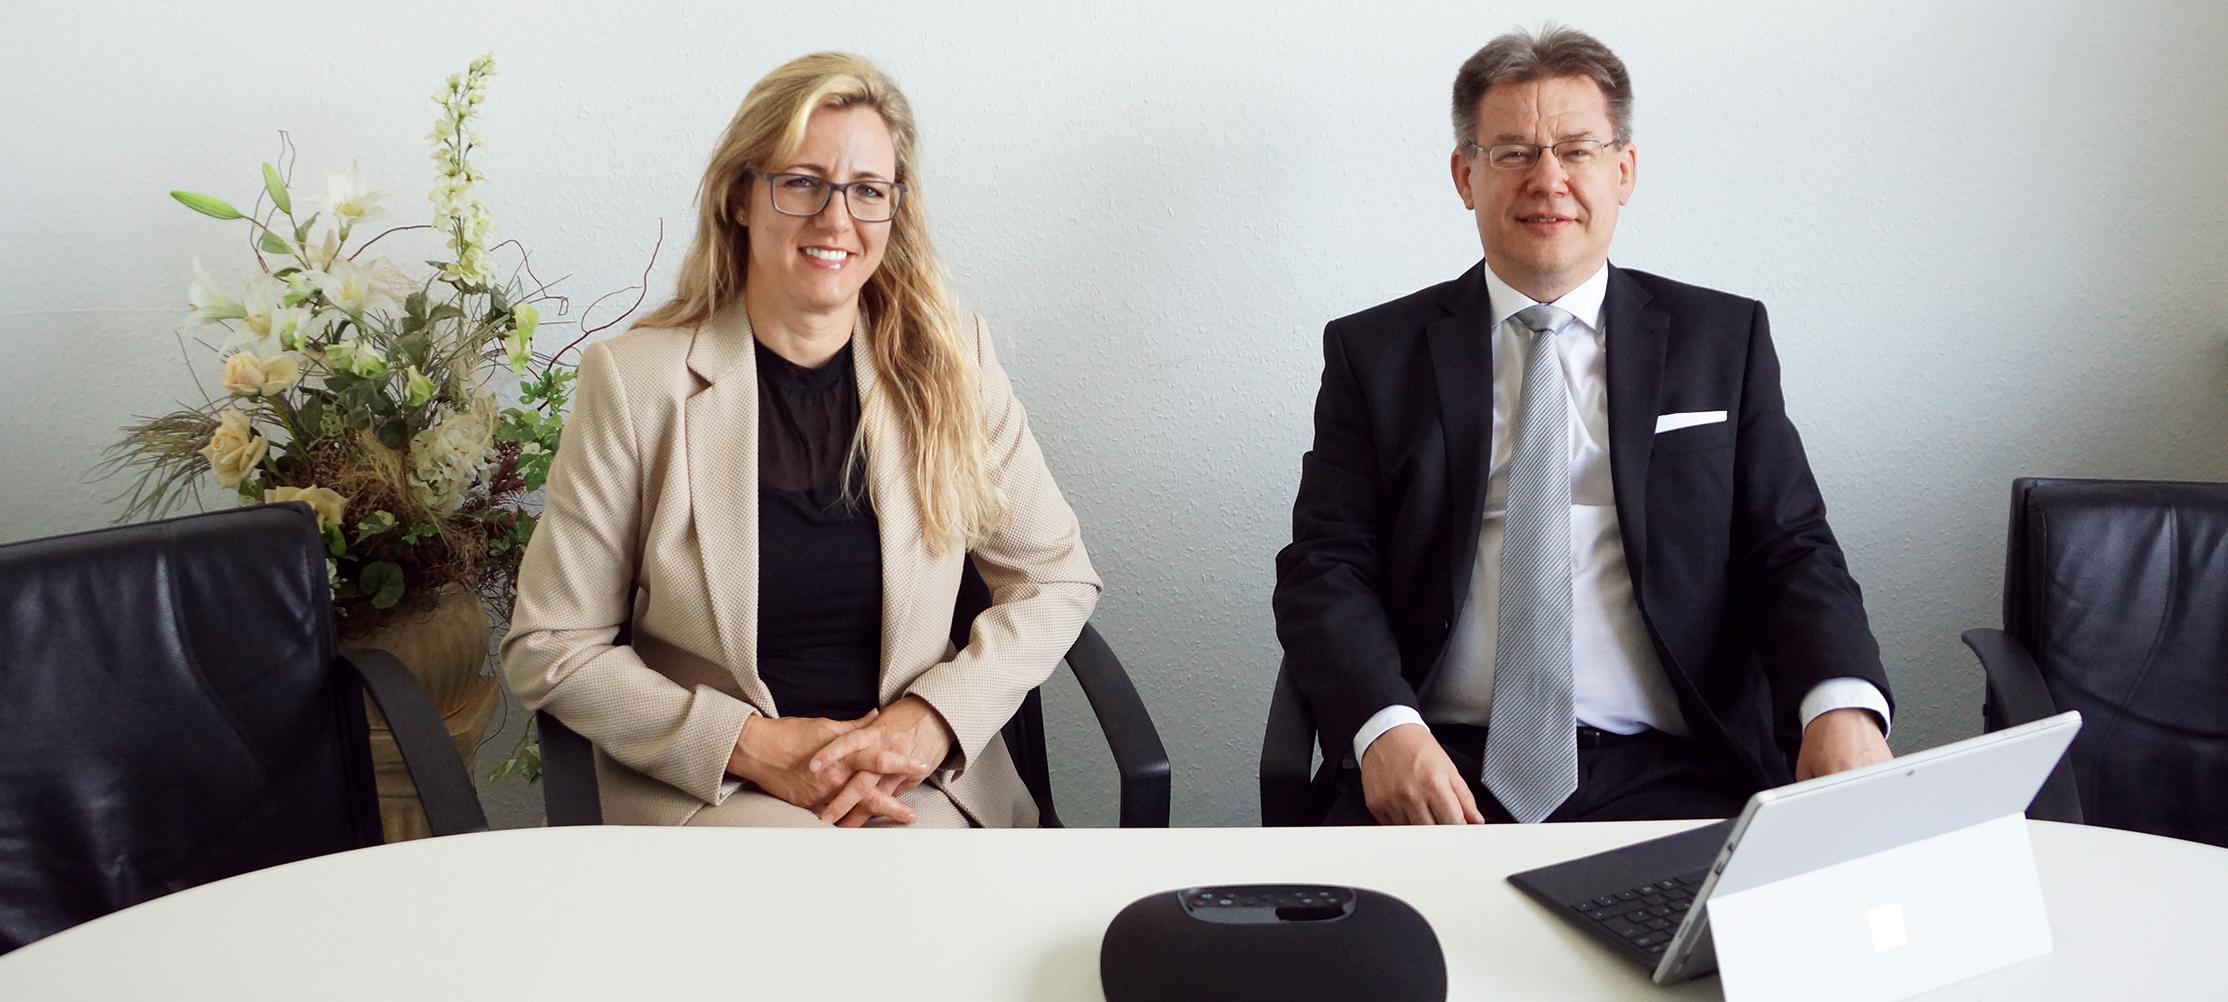 Yvonne Vasters und Michael Knorre